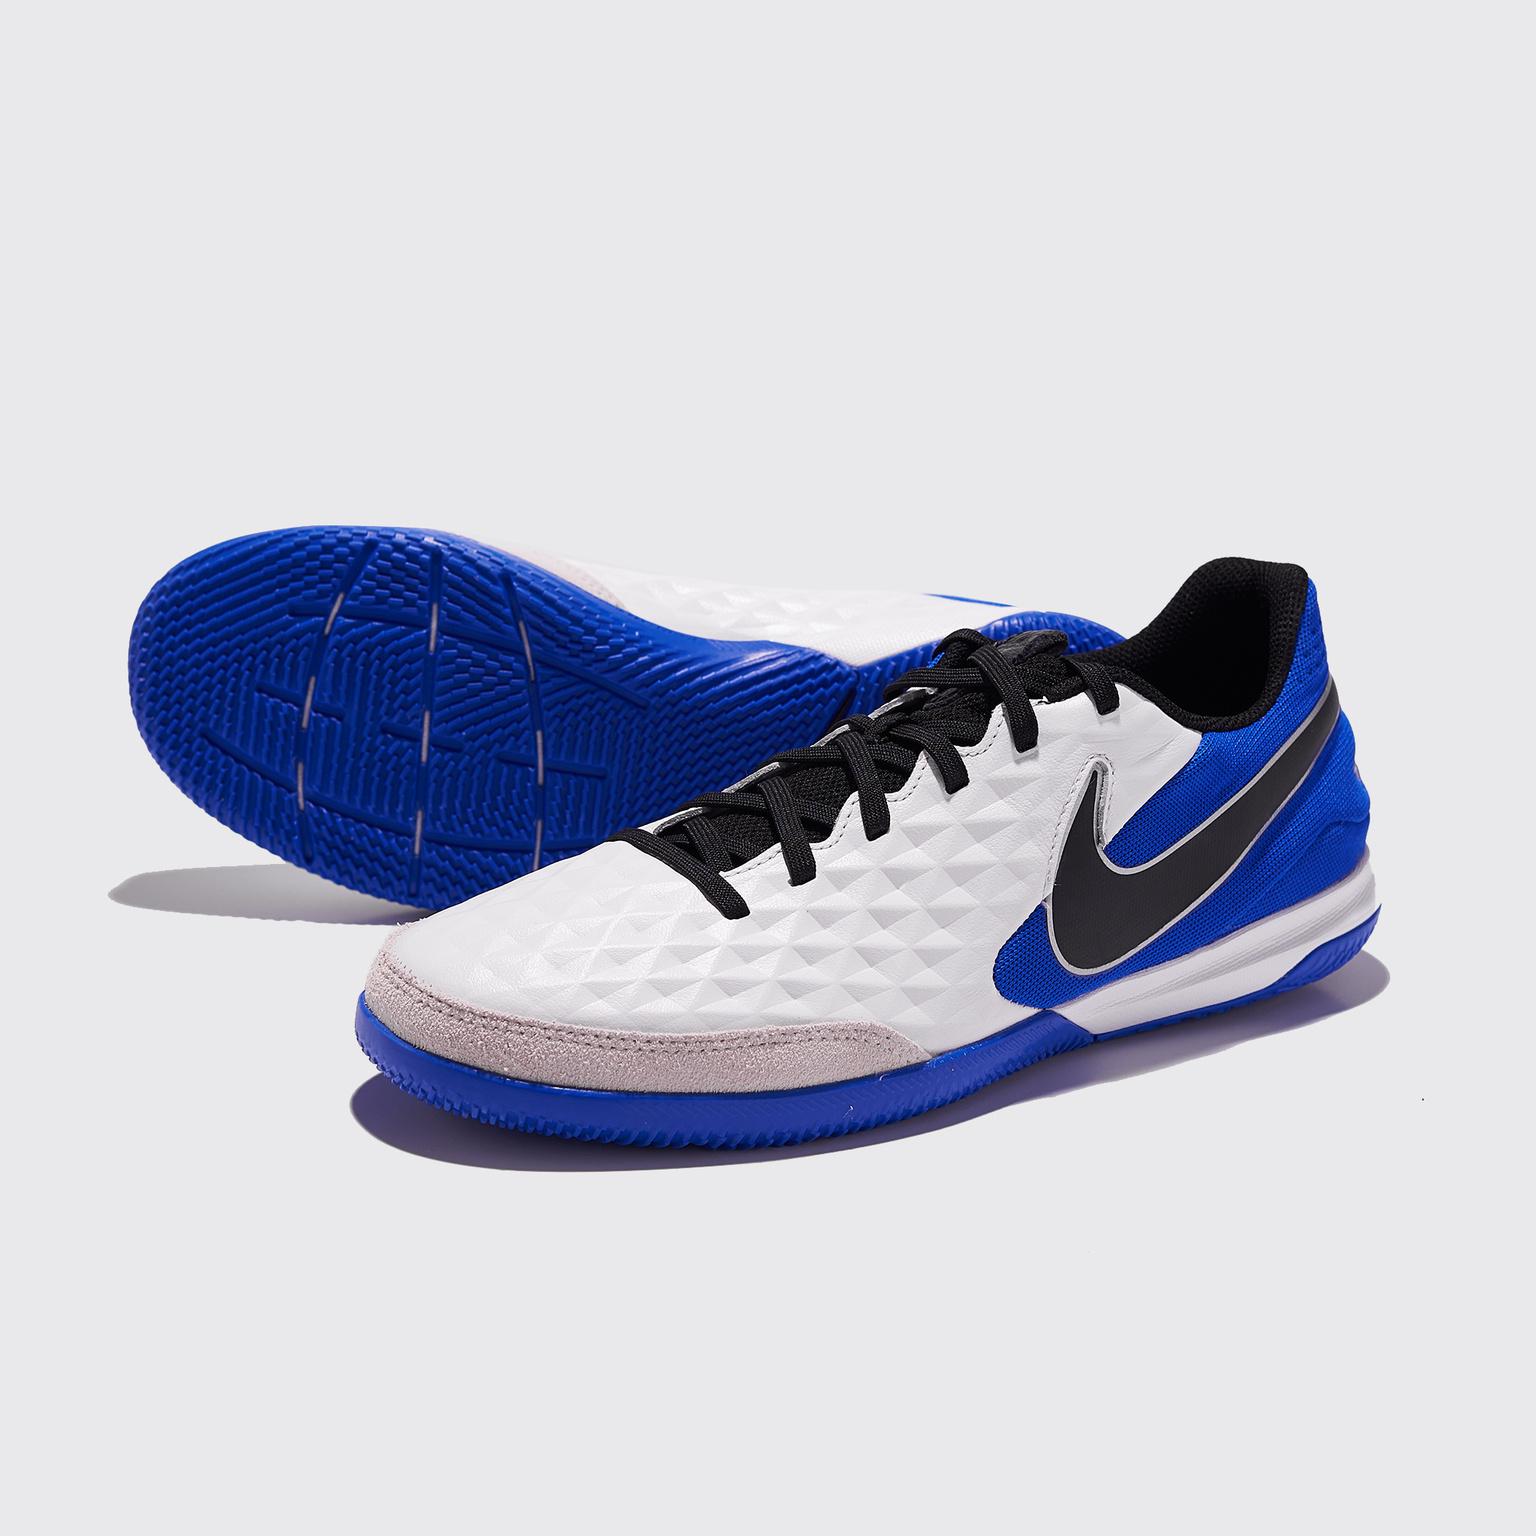 Футзалки Nike Legend 8 Academy IC AT6099-104 футзалки детские nike legend 8 academy ic at5735 606